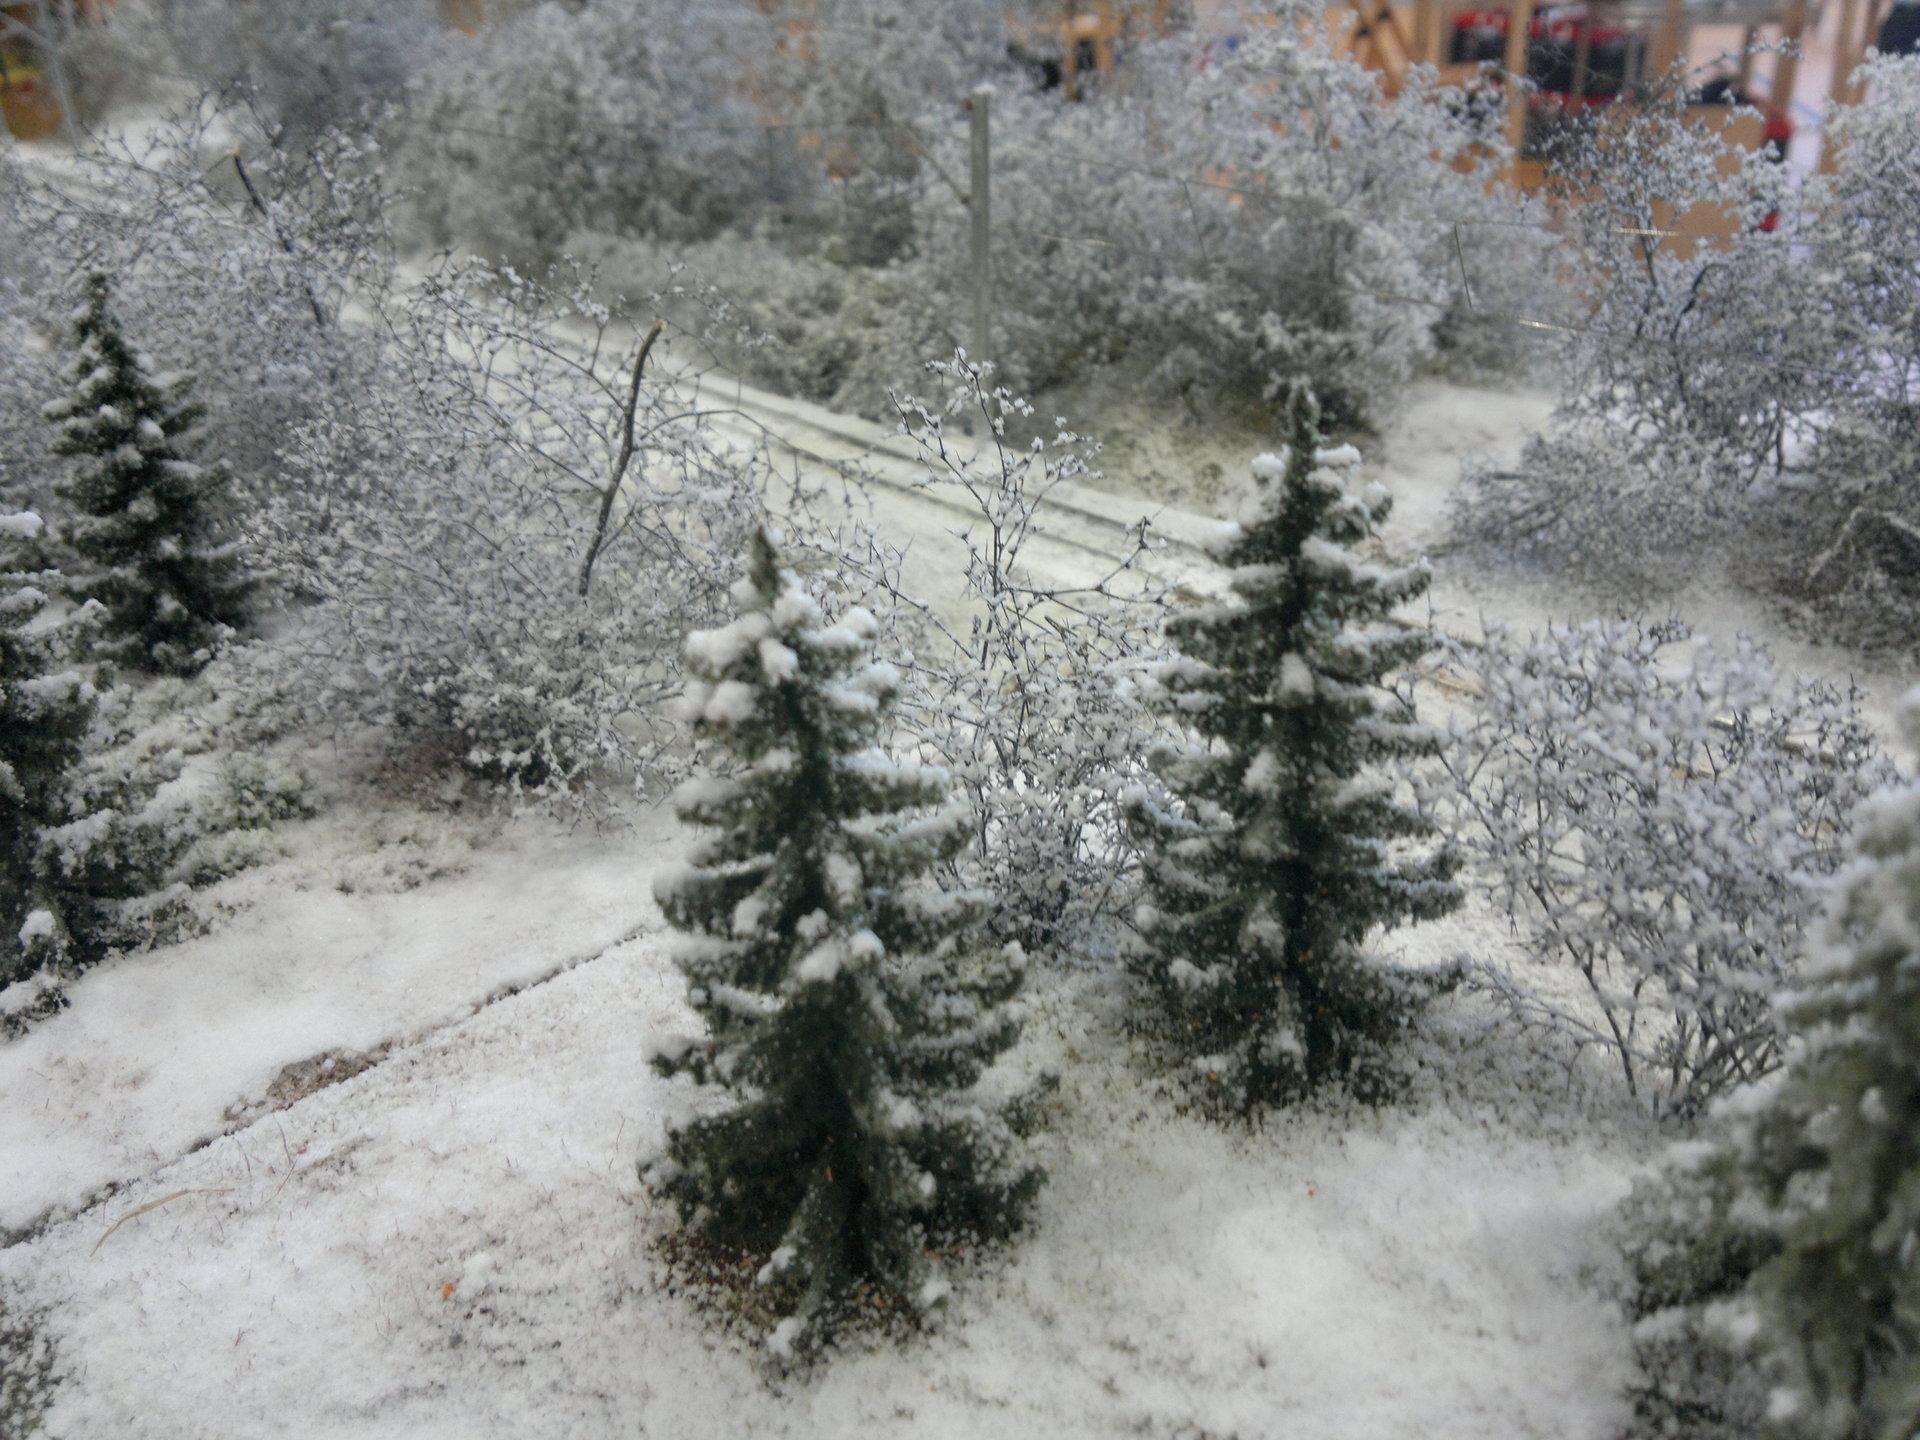 Zimowy las.jpg